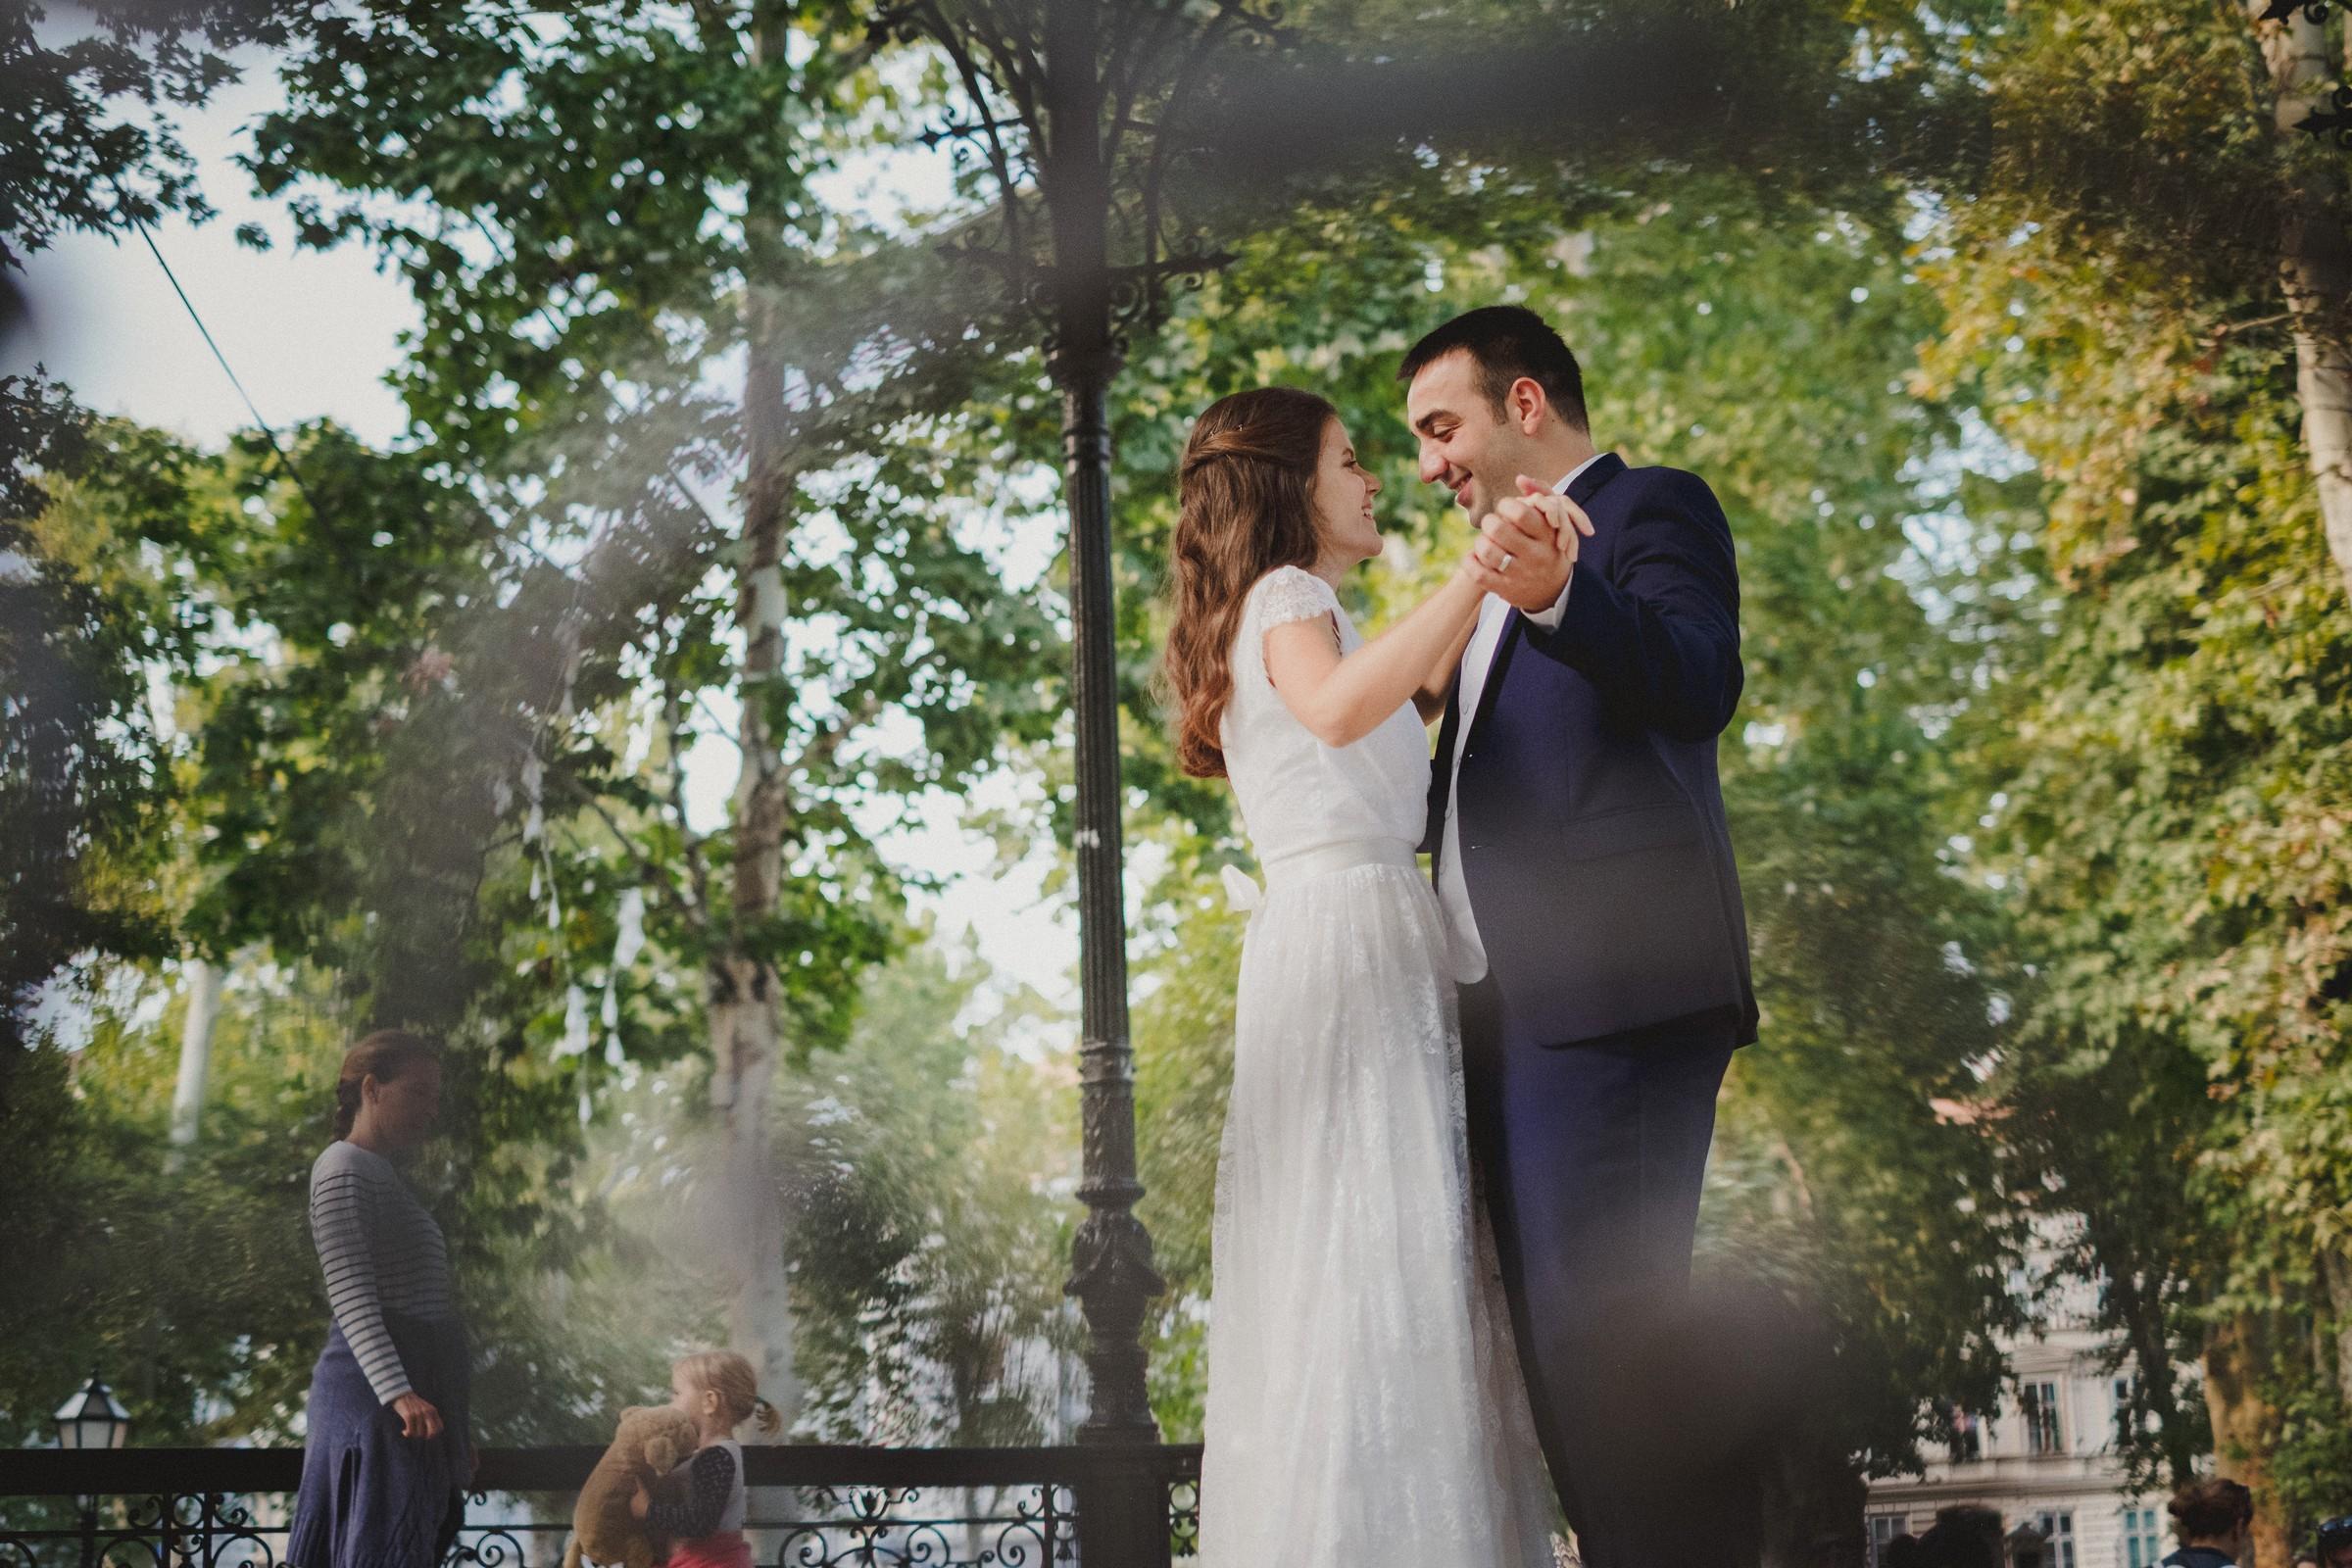 couple dancing in zrinjevac pavillion